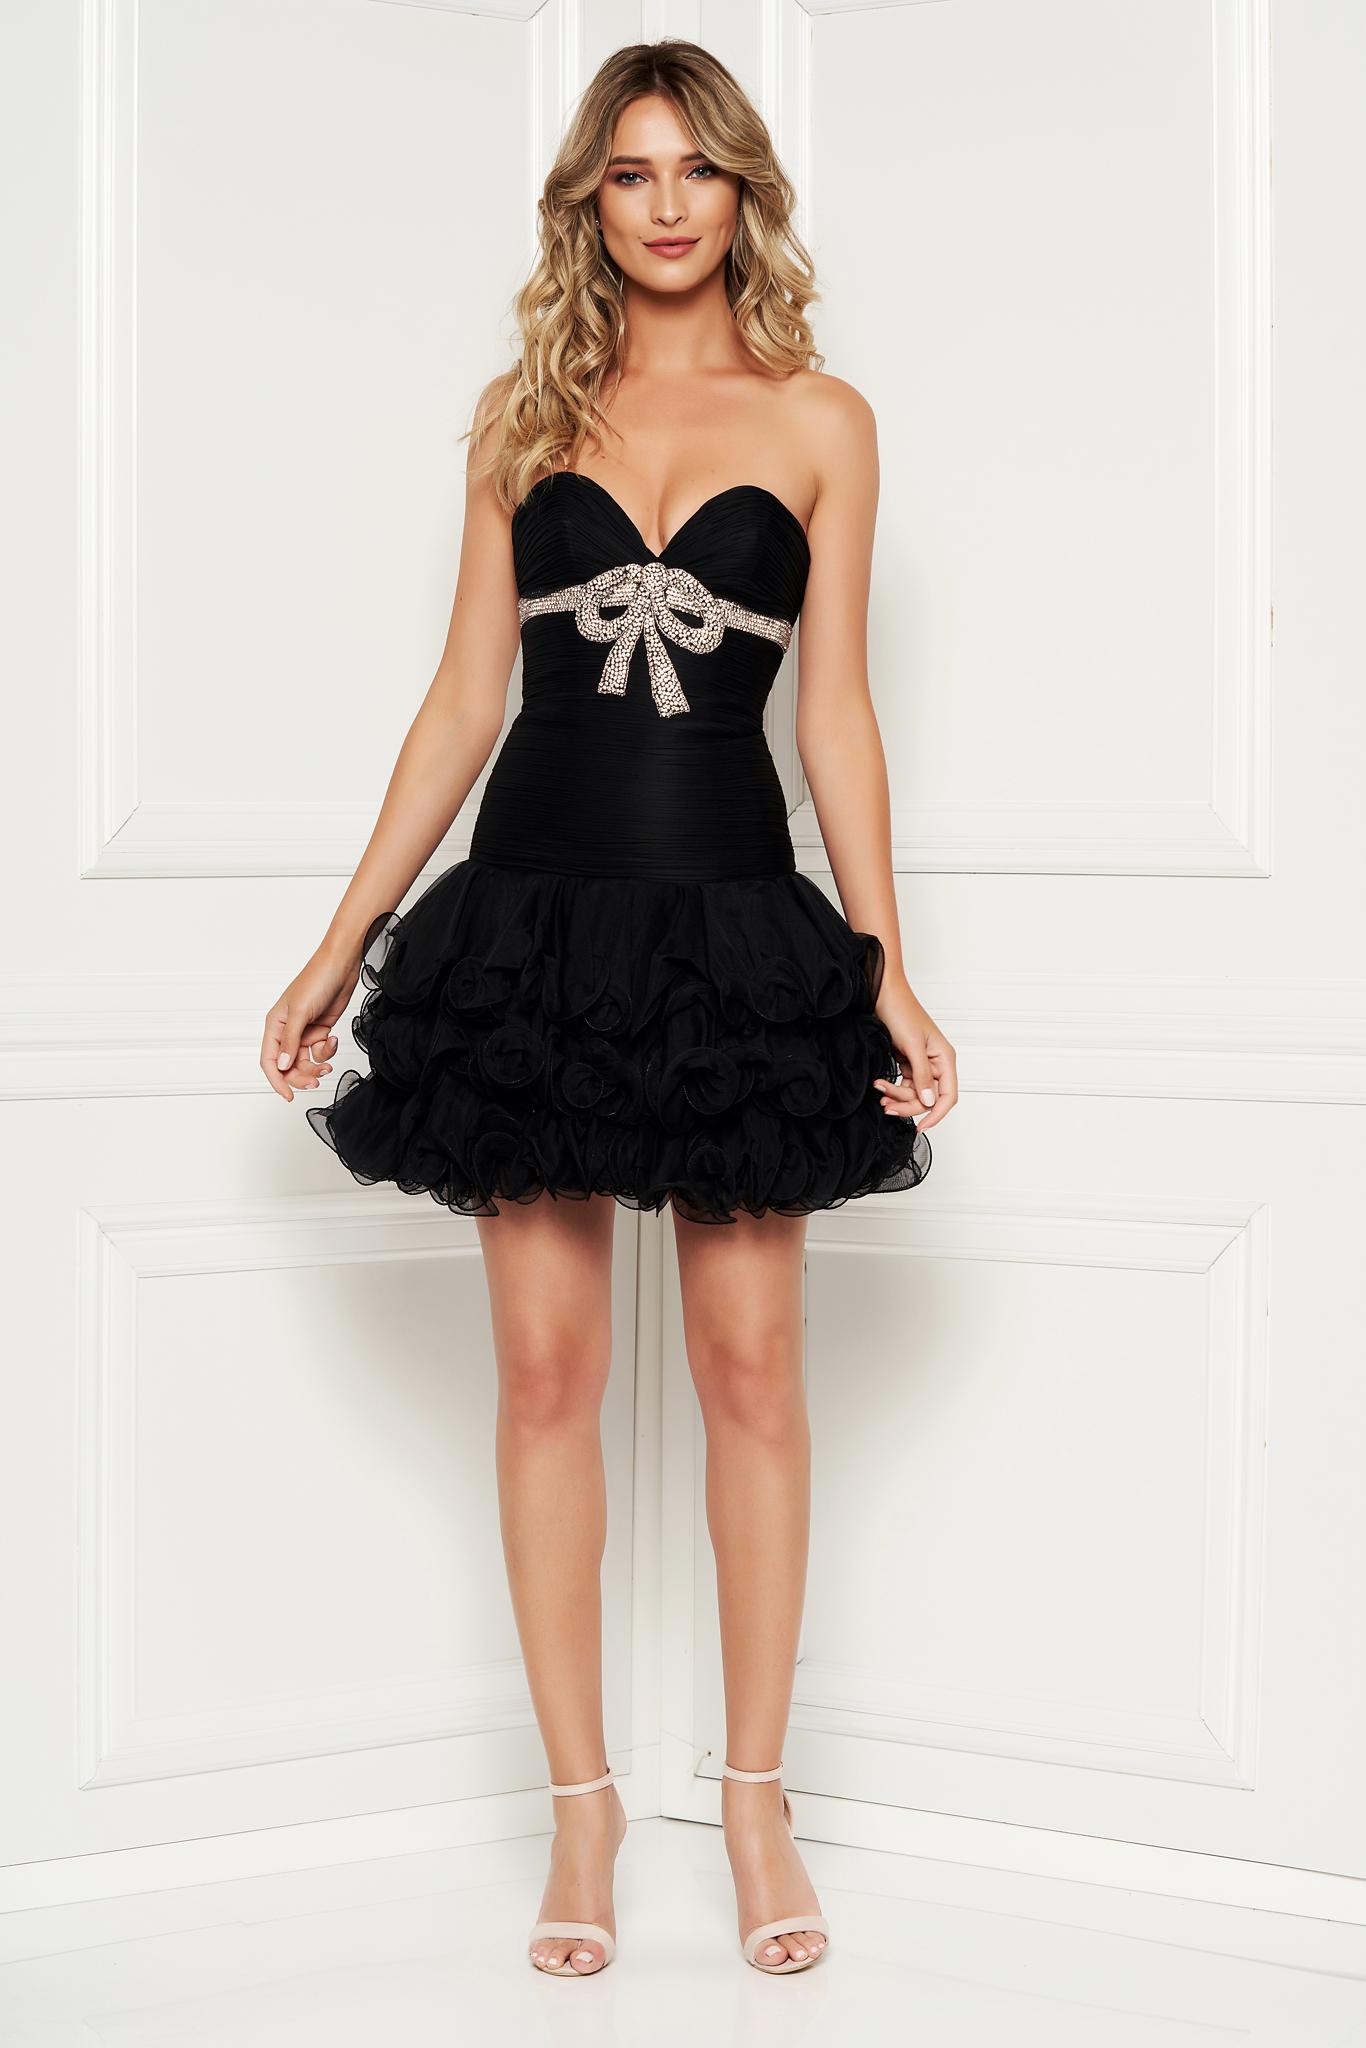 Sherri Hill luxurious black dress